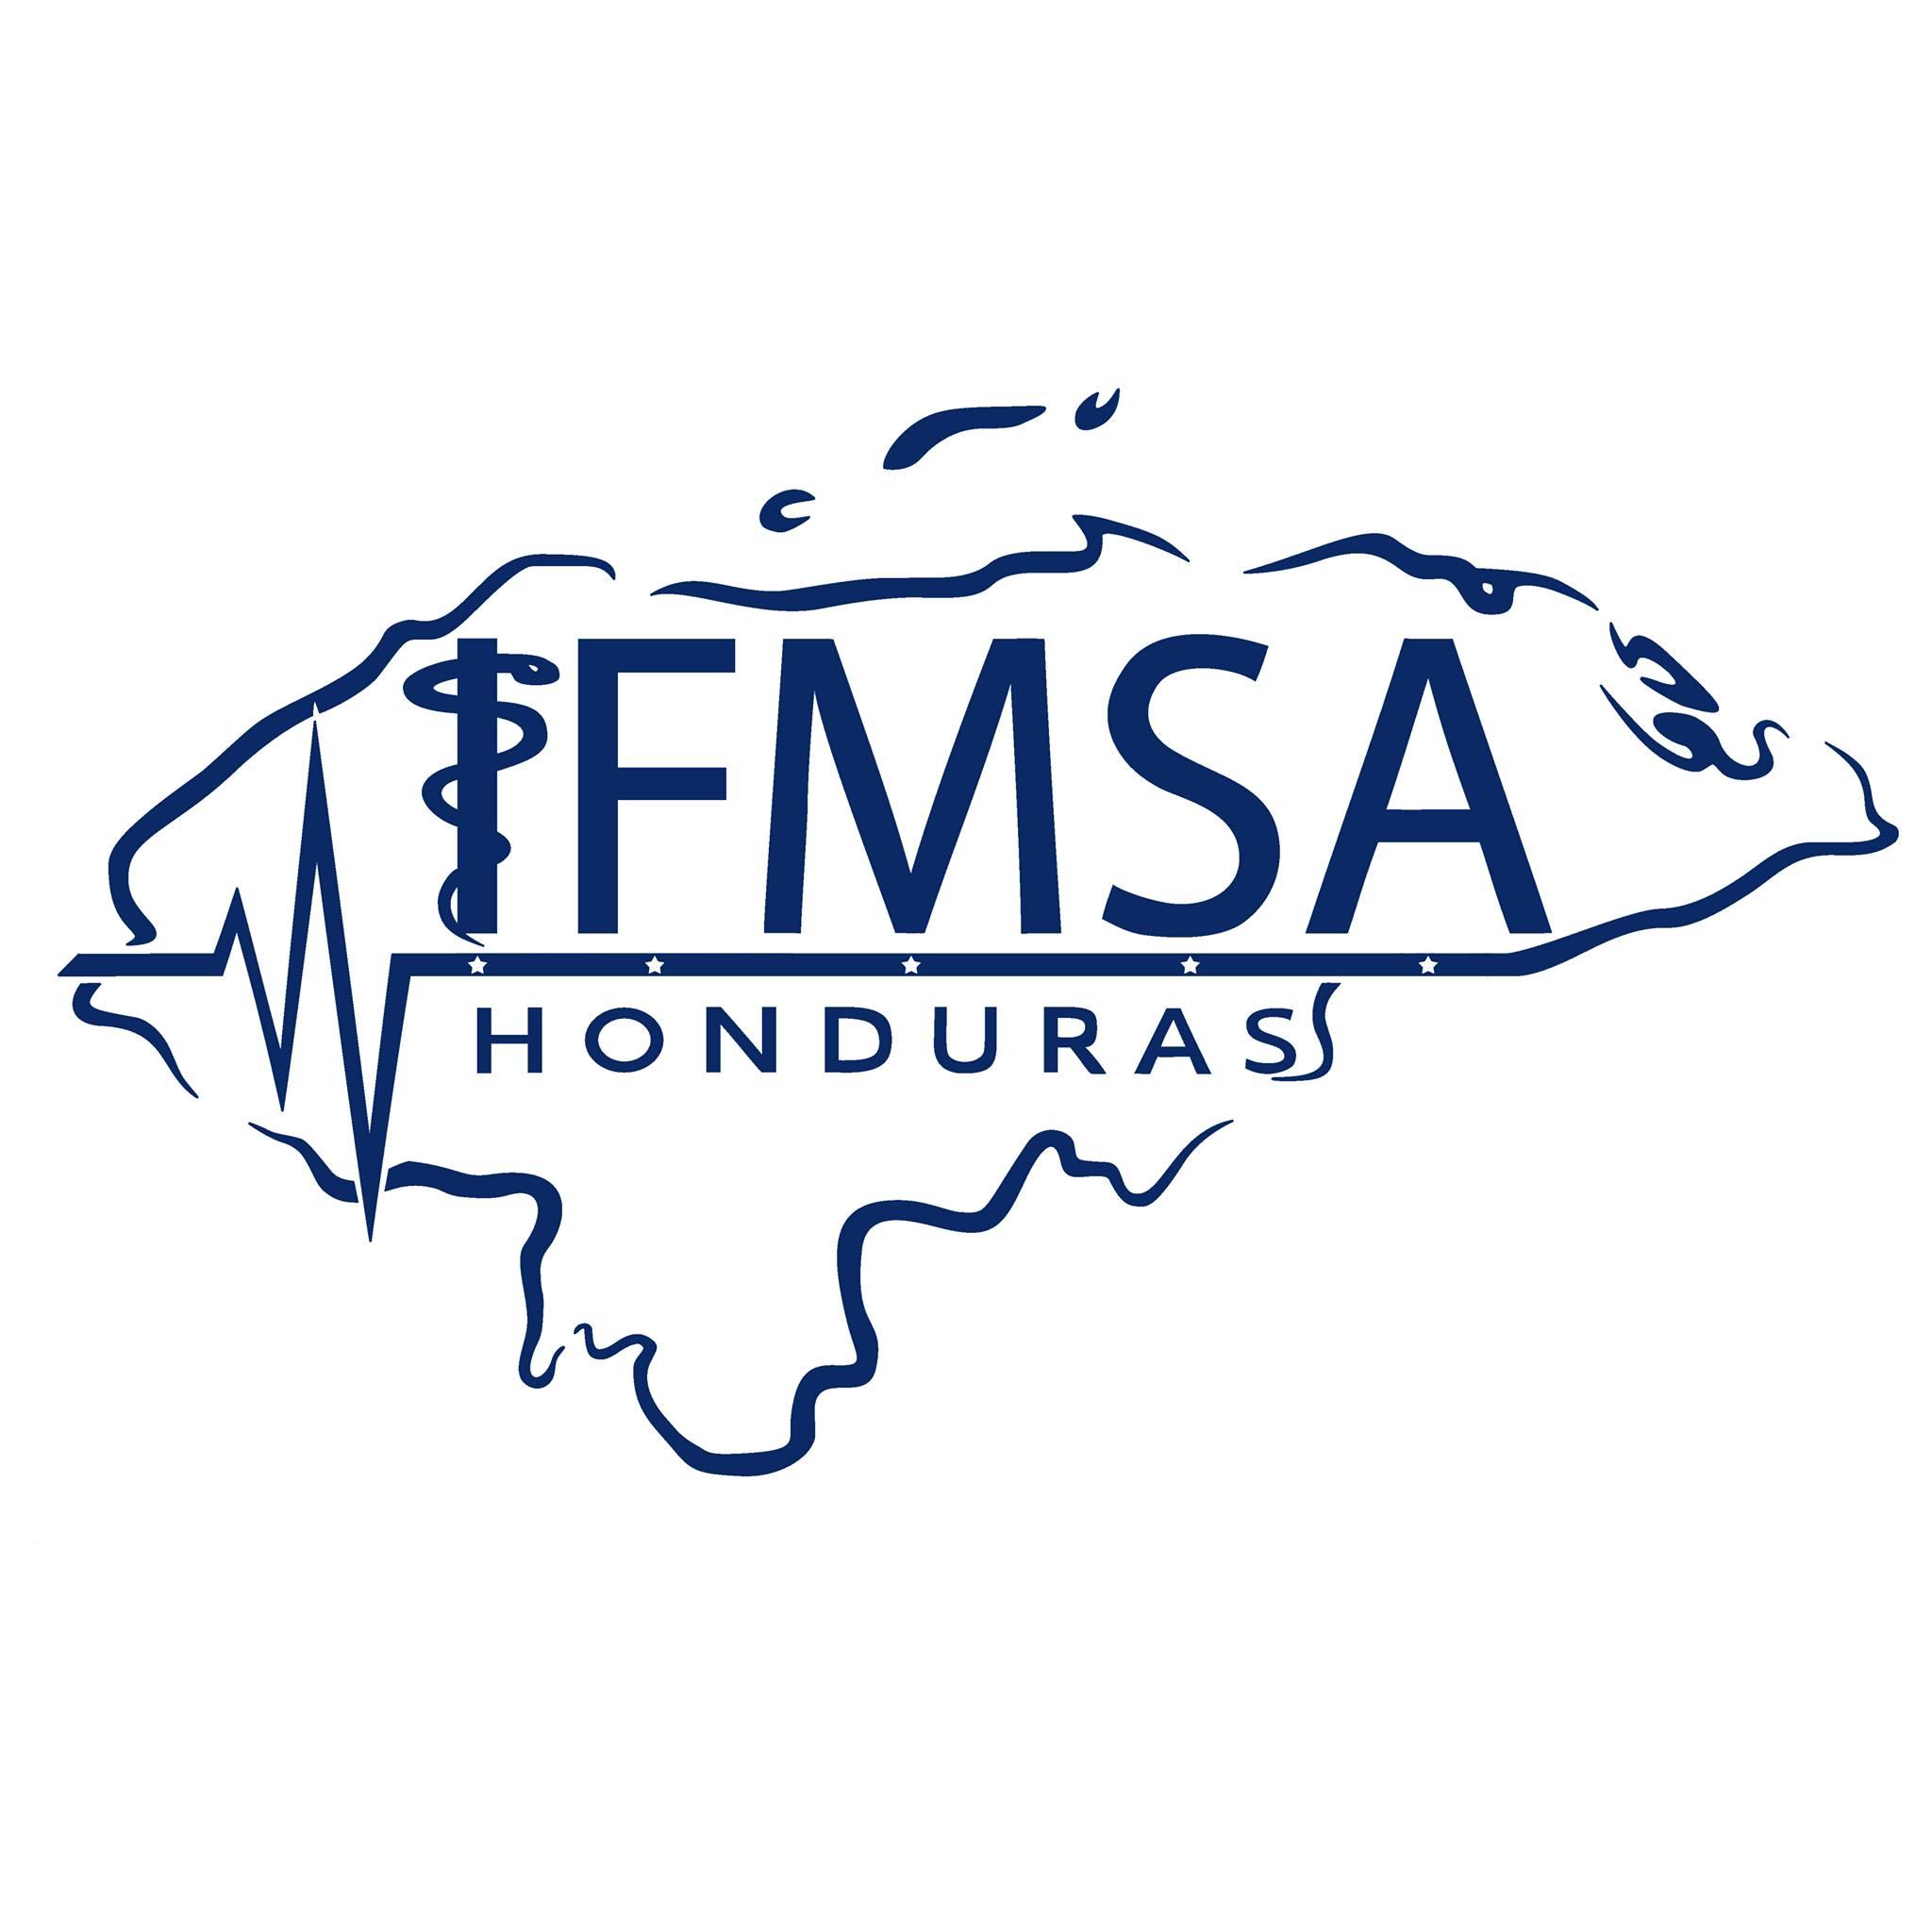 IFMSA-Honduras